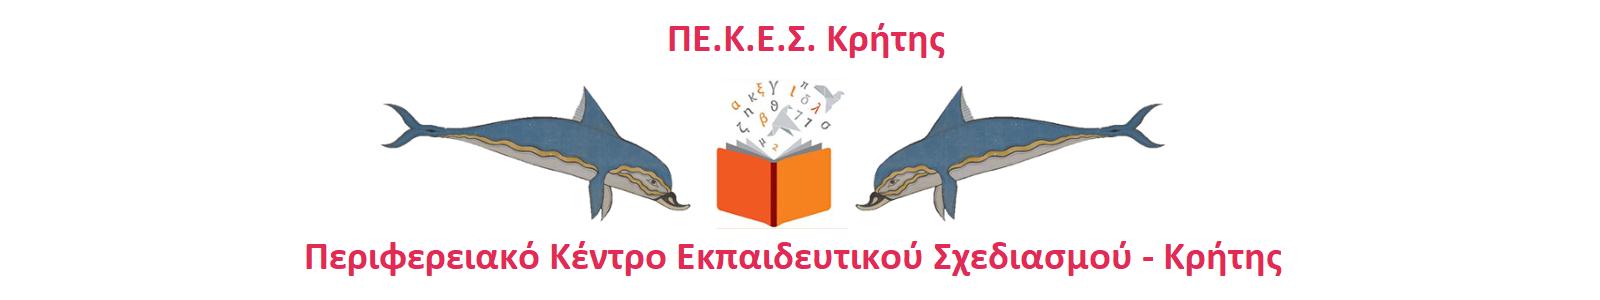 PEKES Kritis